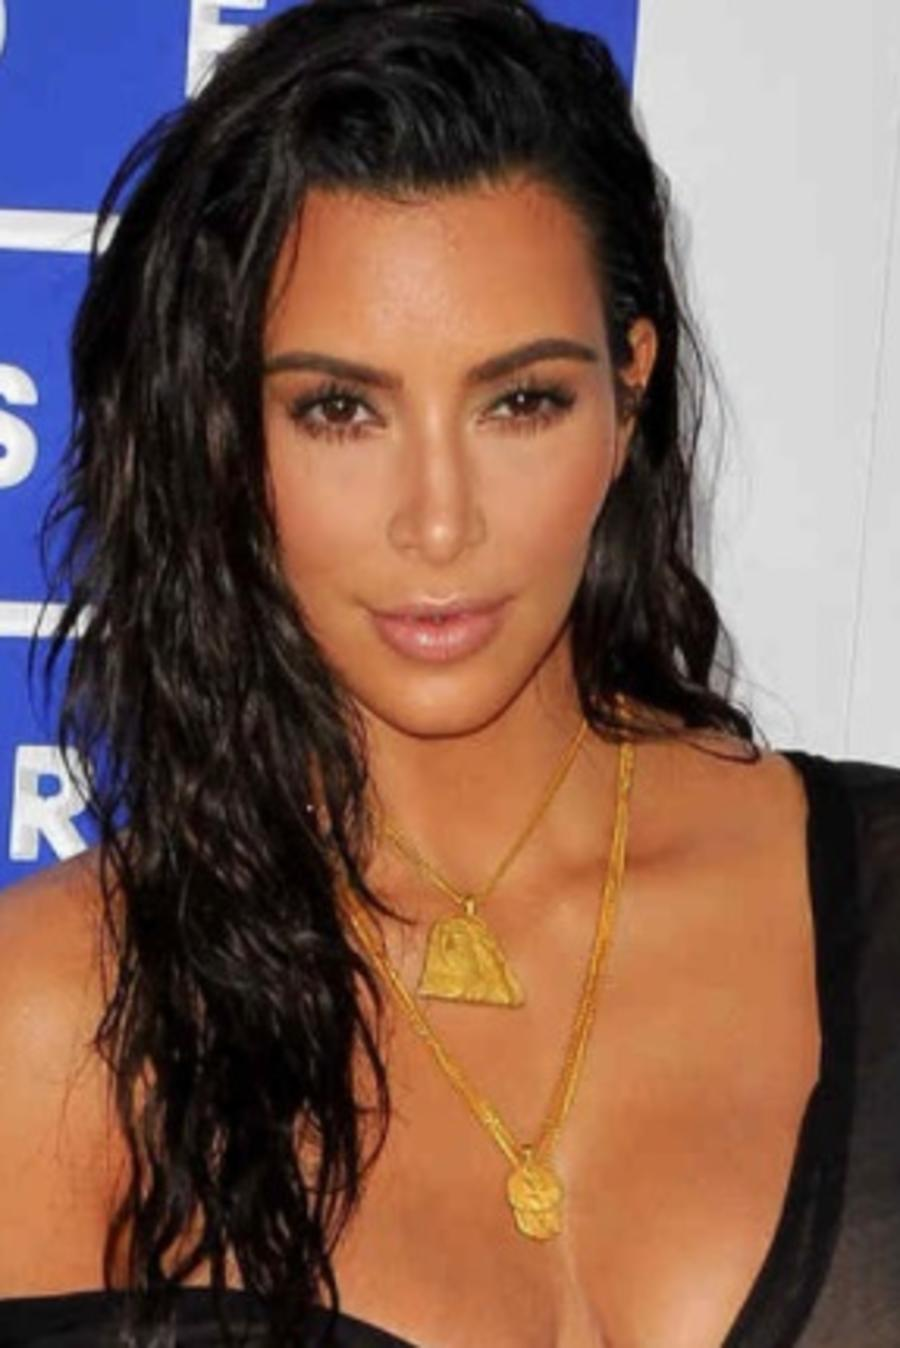 Kim Kardashian West Reveals New Name of Shapewear Line Following Backlash